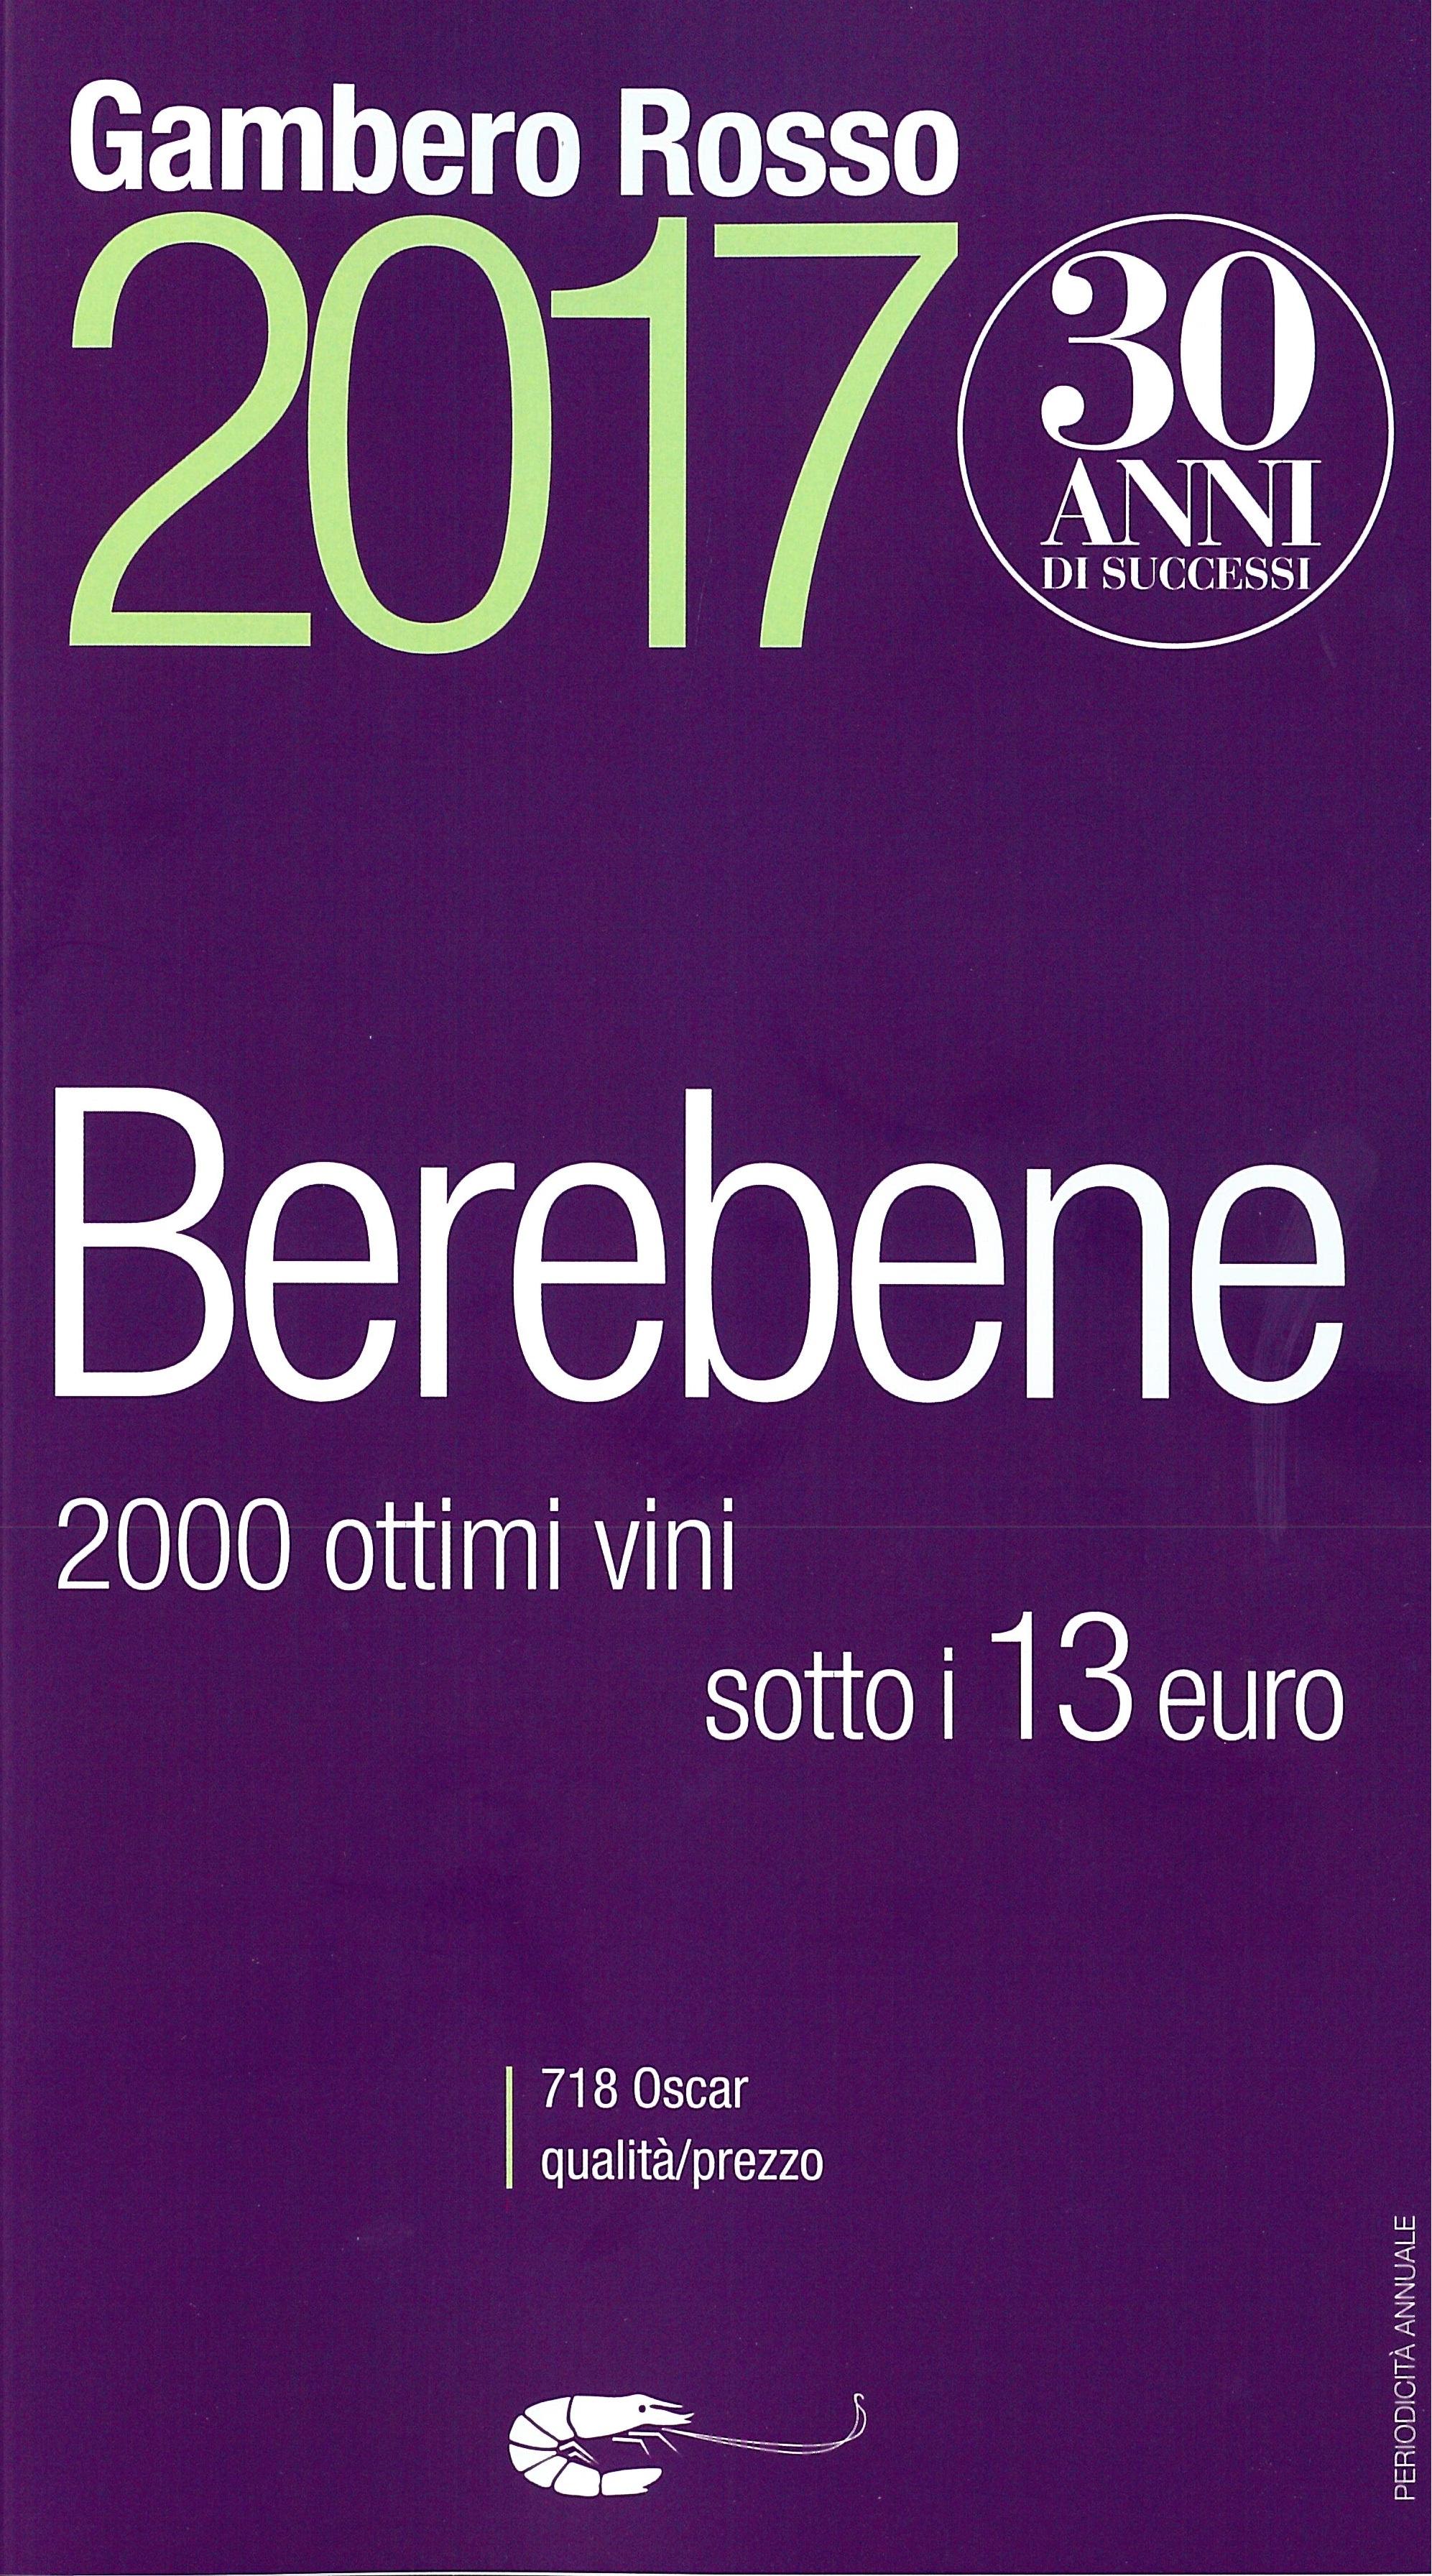 Gambero Rosso - Bere Bene Low Cost_2017_Cover.jpg